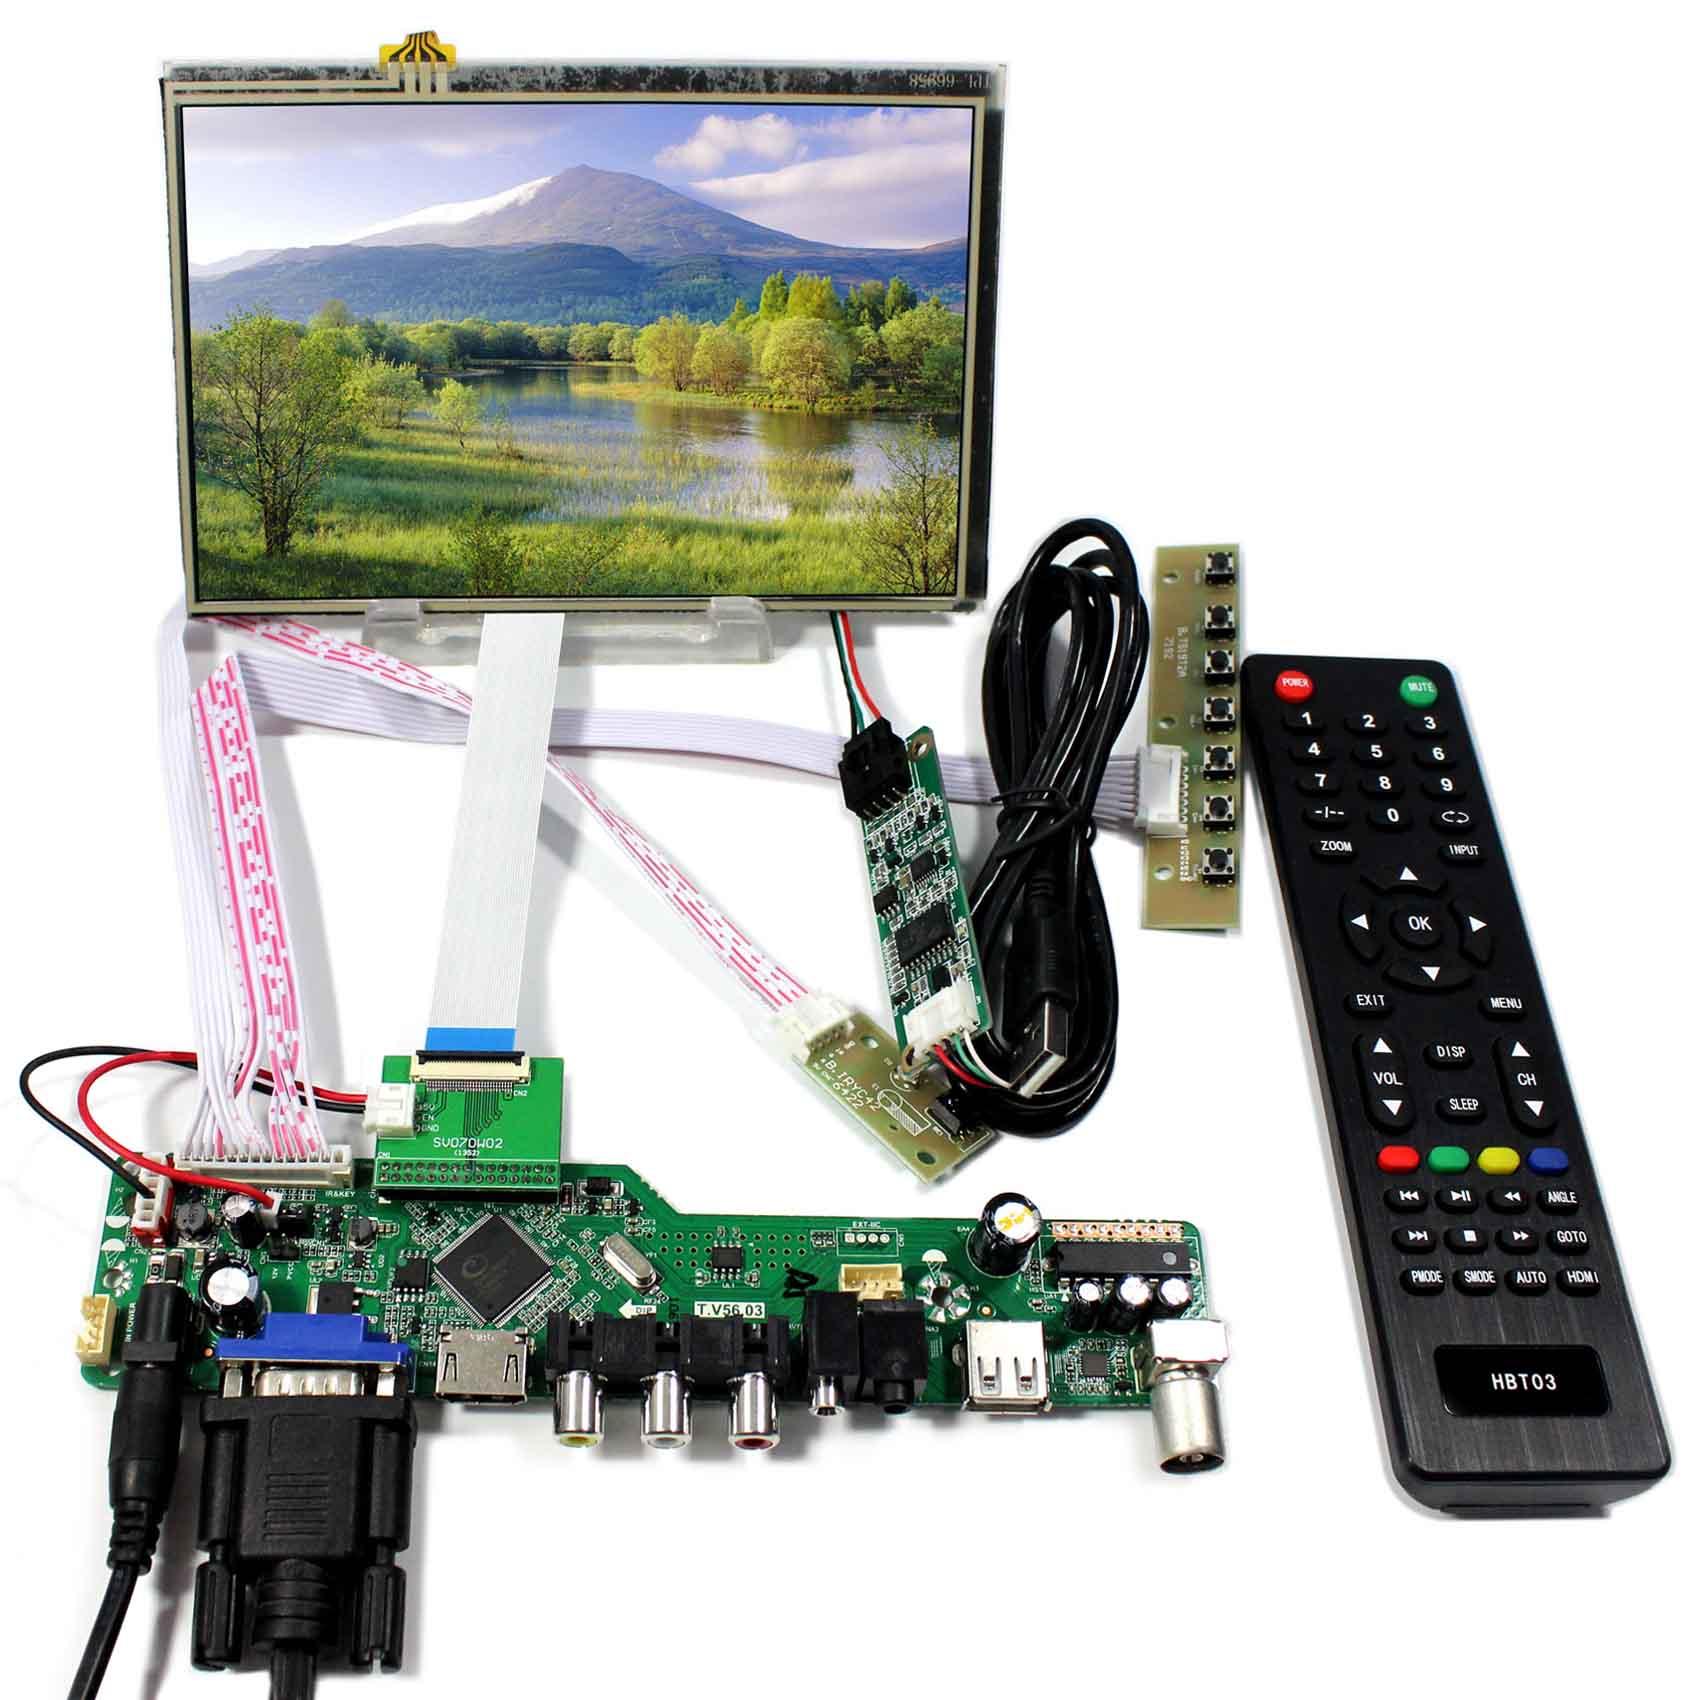 все цены на TV PC HDMI CVBS RF USB AUDIO Driver Board With 7inch 1280x800 HSD070PWW1-C00 Touch LCD Screen онлайн